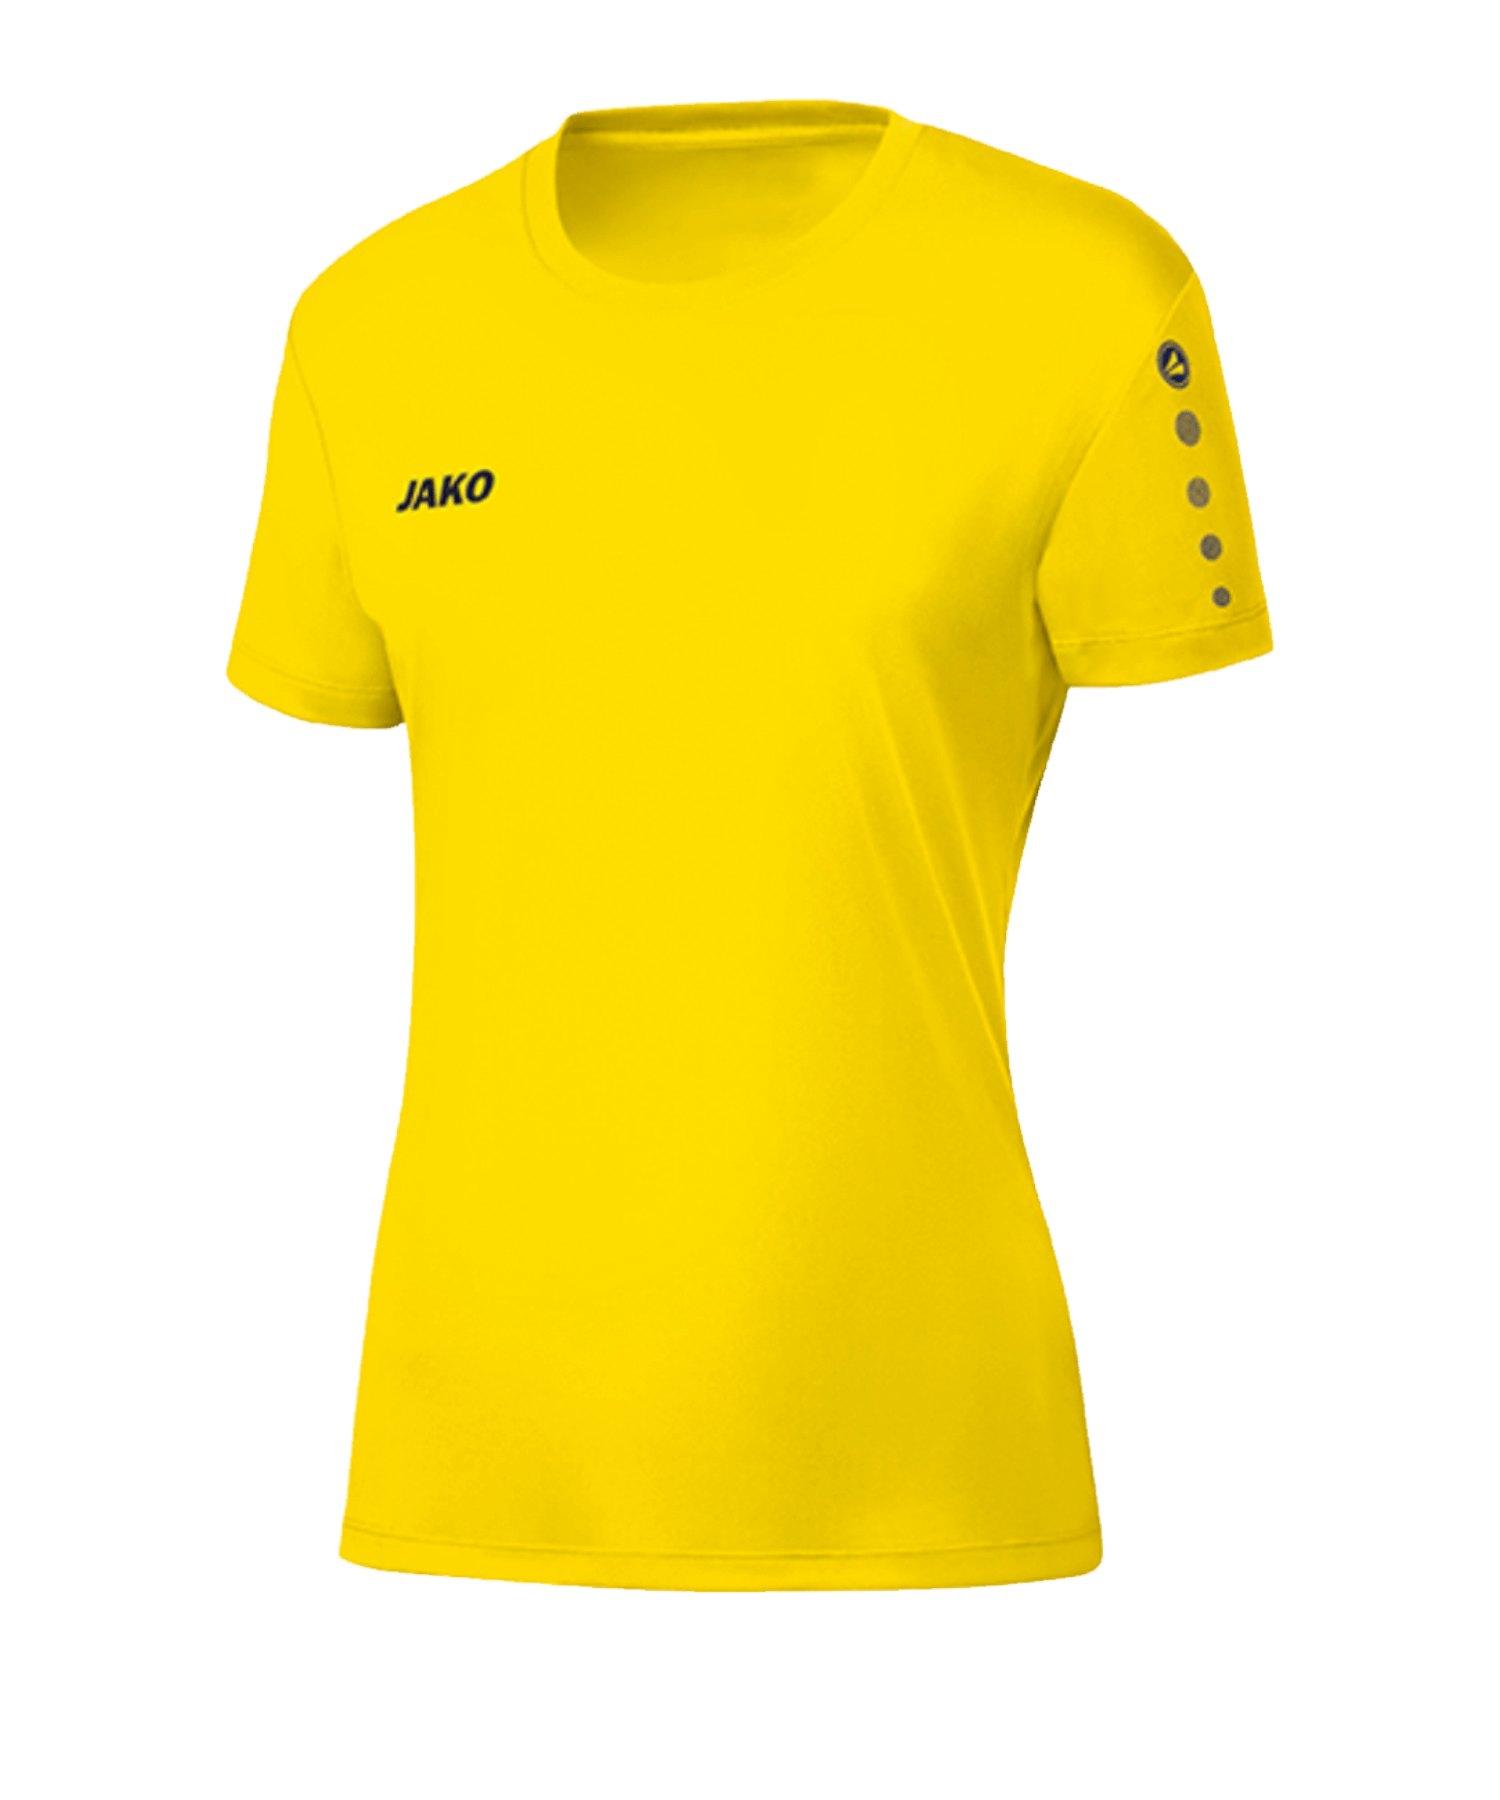 JAKO Team Trikot Damen Gelb F03 - gelb